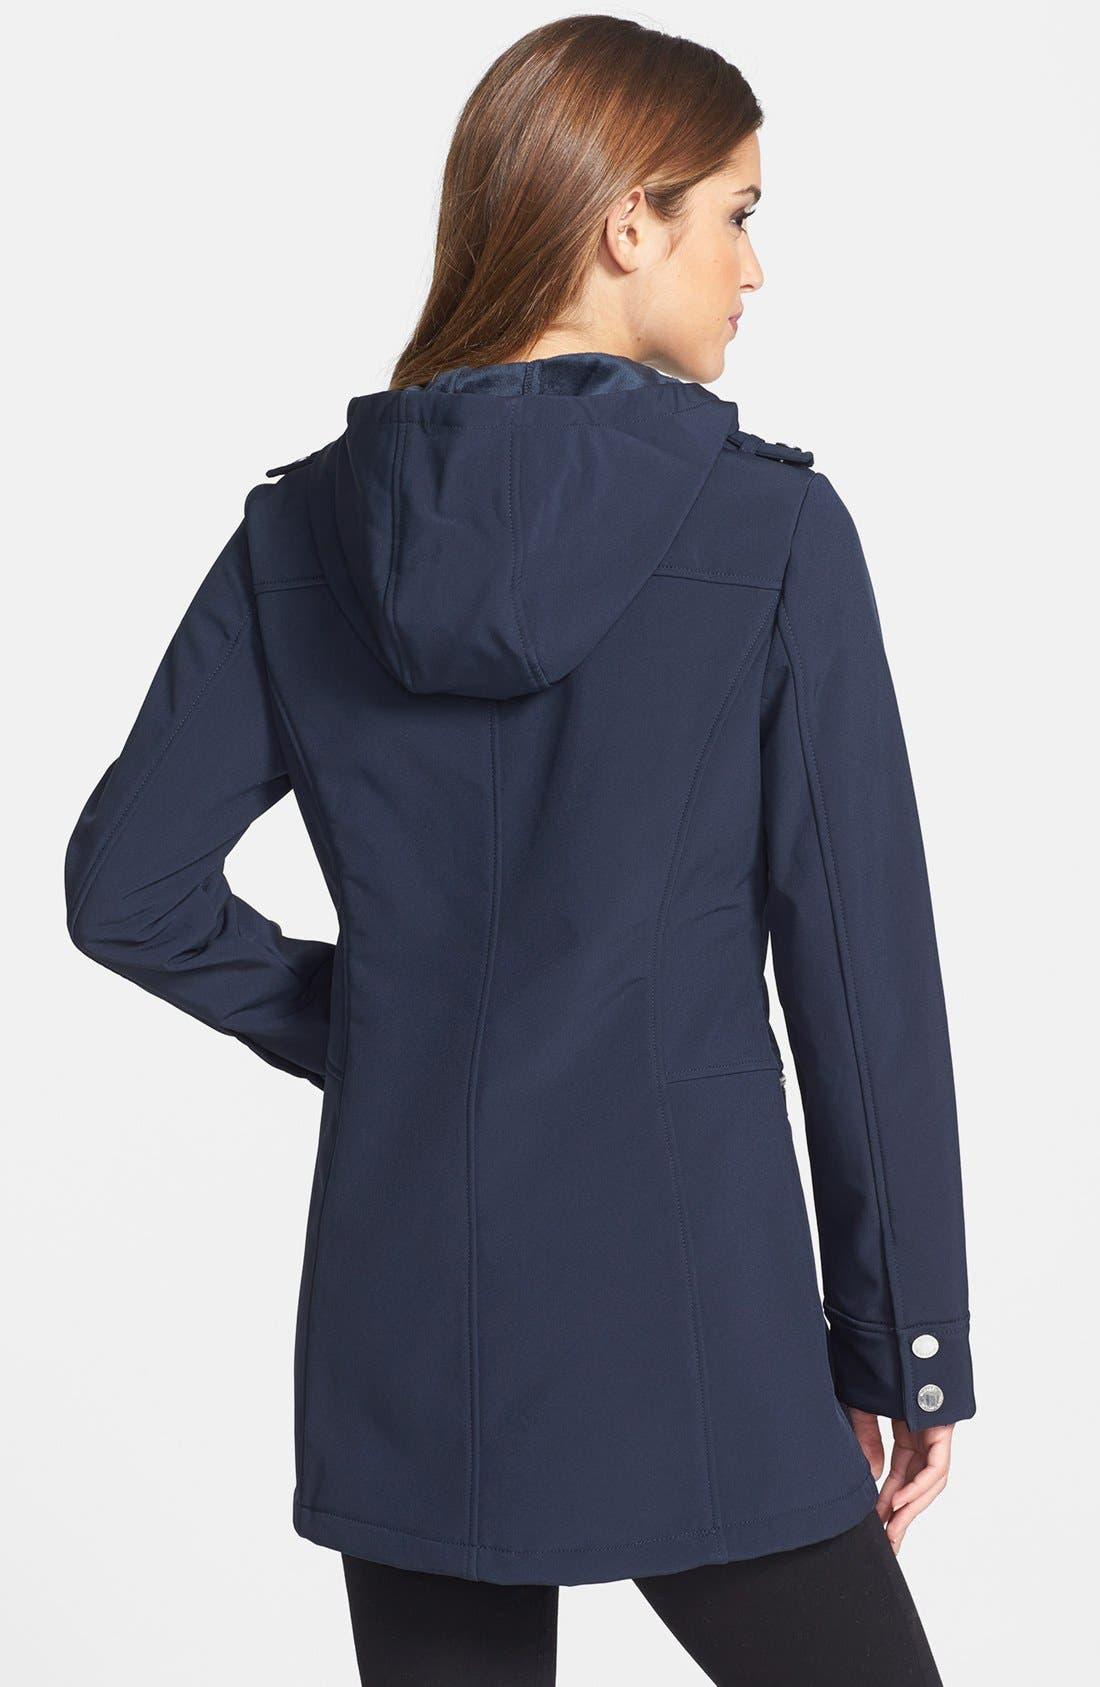 Alternate Image 2  - MICHAEL Michael Kors Faux Leather Trim Soft Shell Jacket (Regular & Petite)